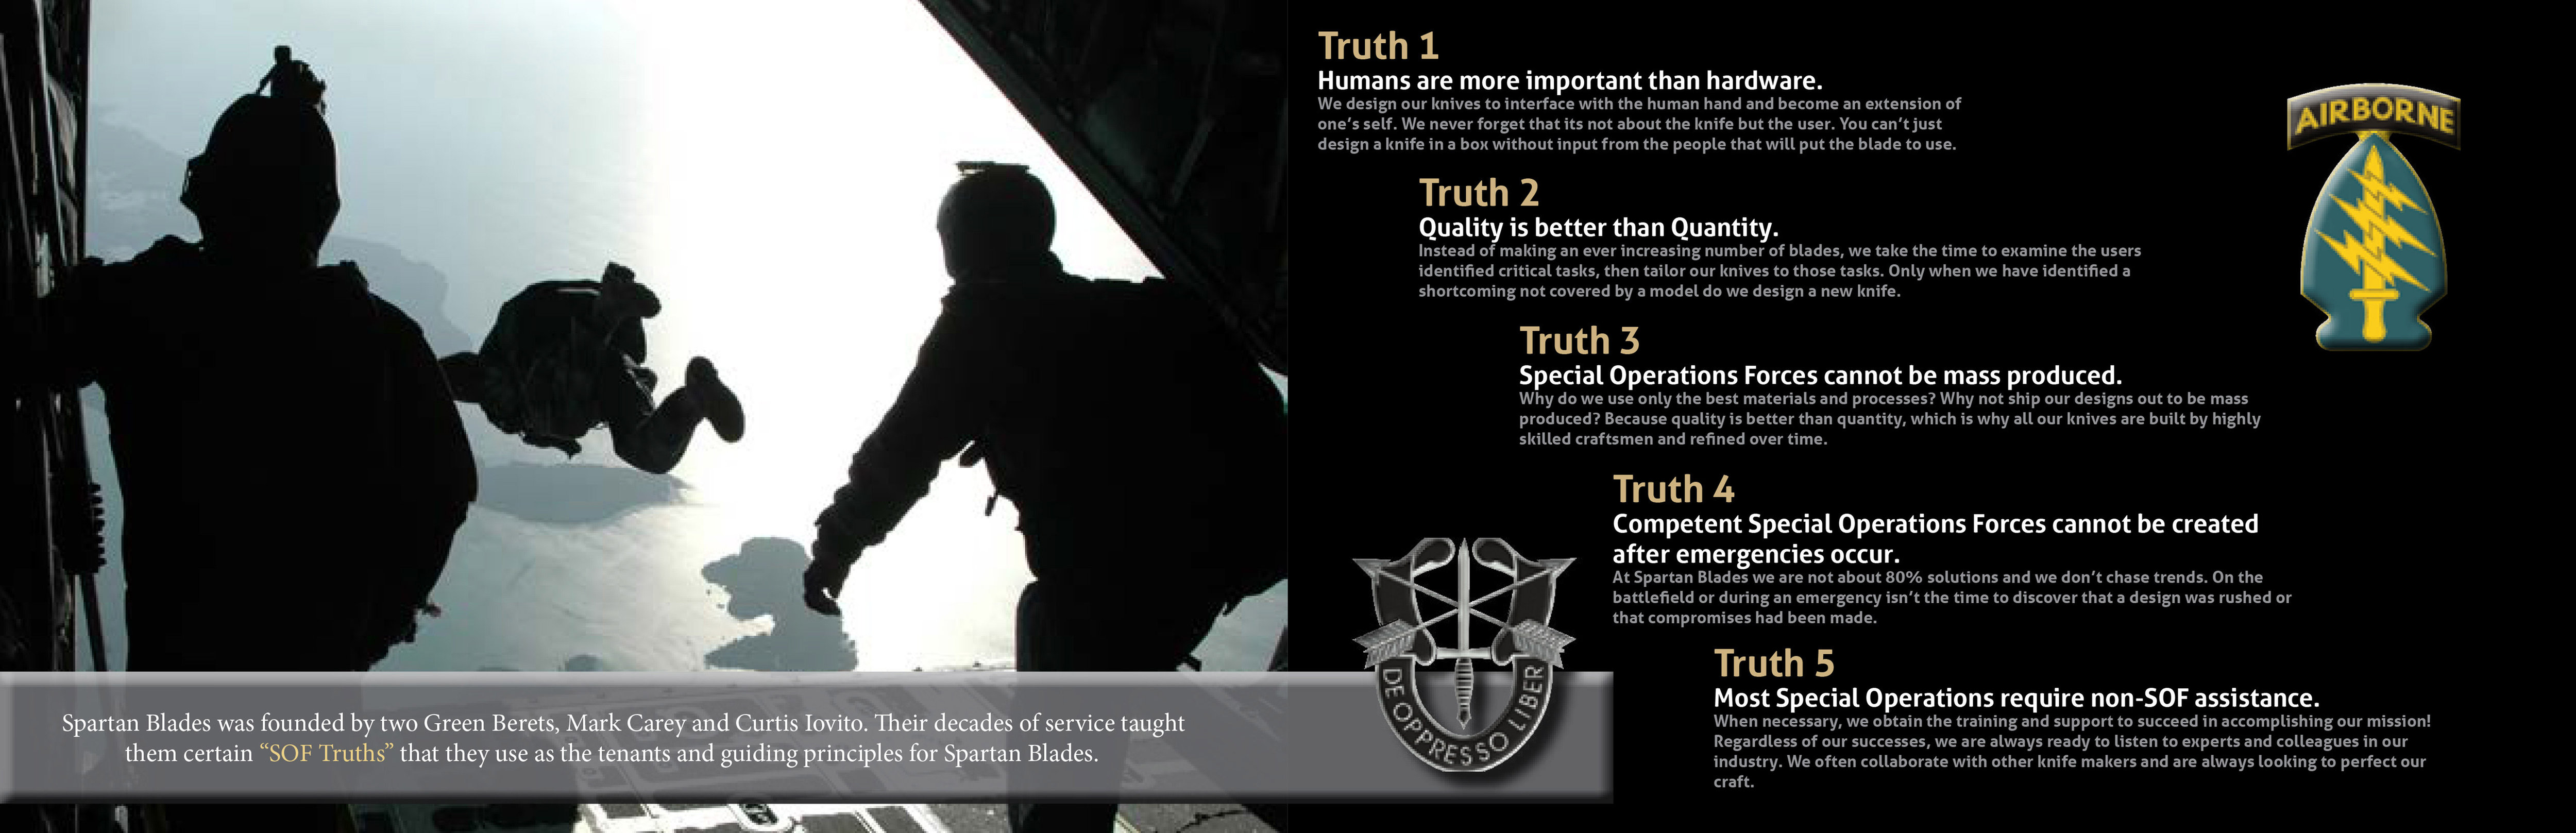 spartan-blades-truths.jpg